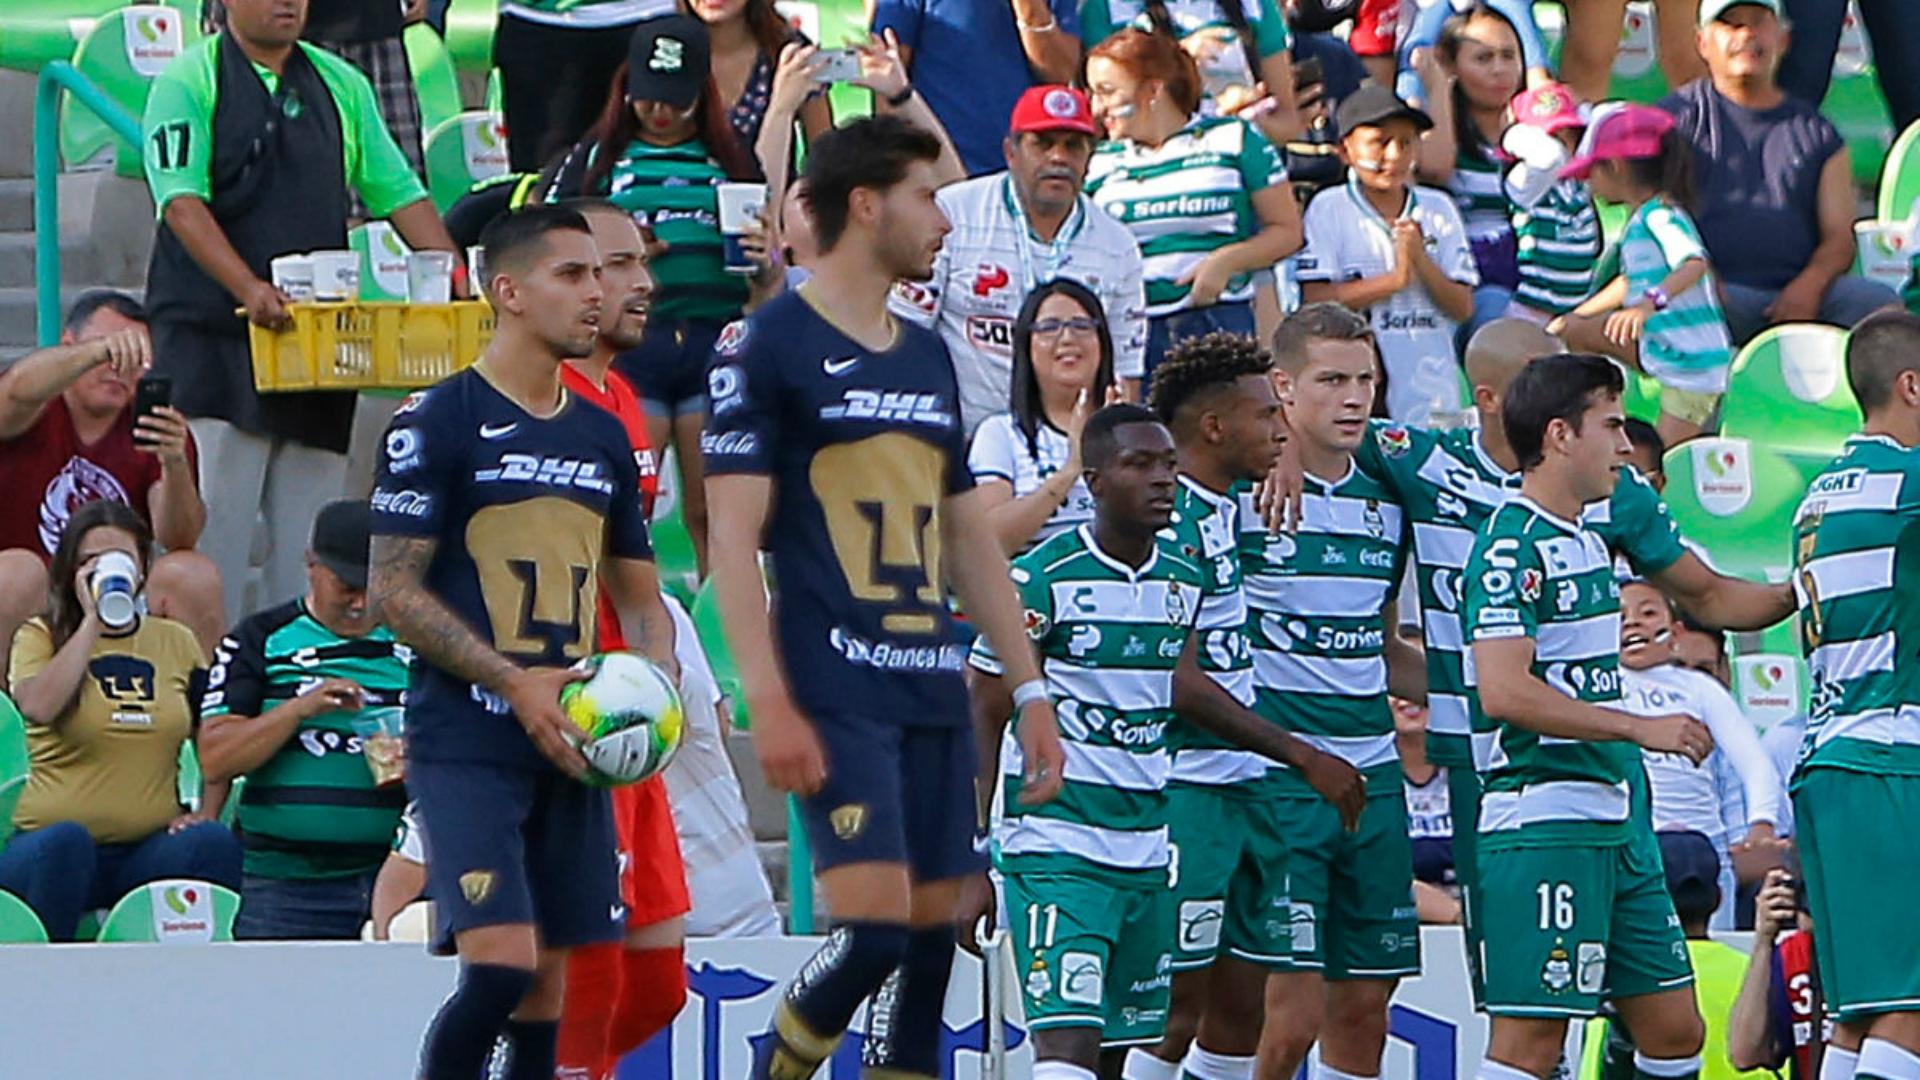 Calendario Pumas Rugby 2019.Proximo Partido De Pumas Contra Quien Va Partidos